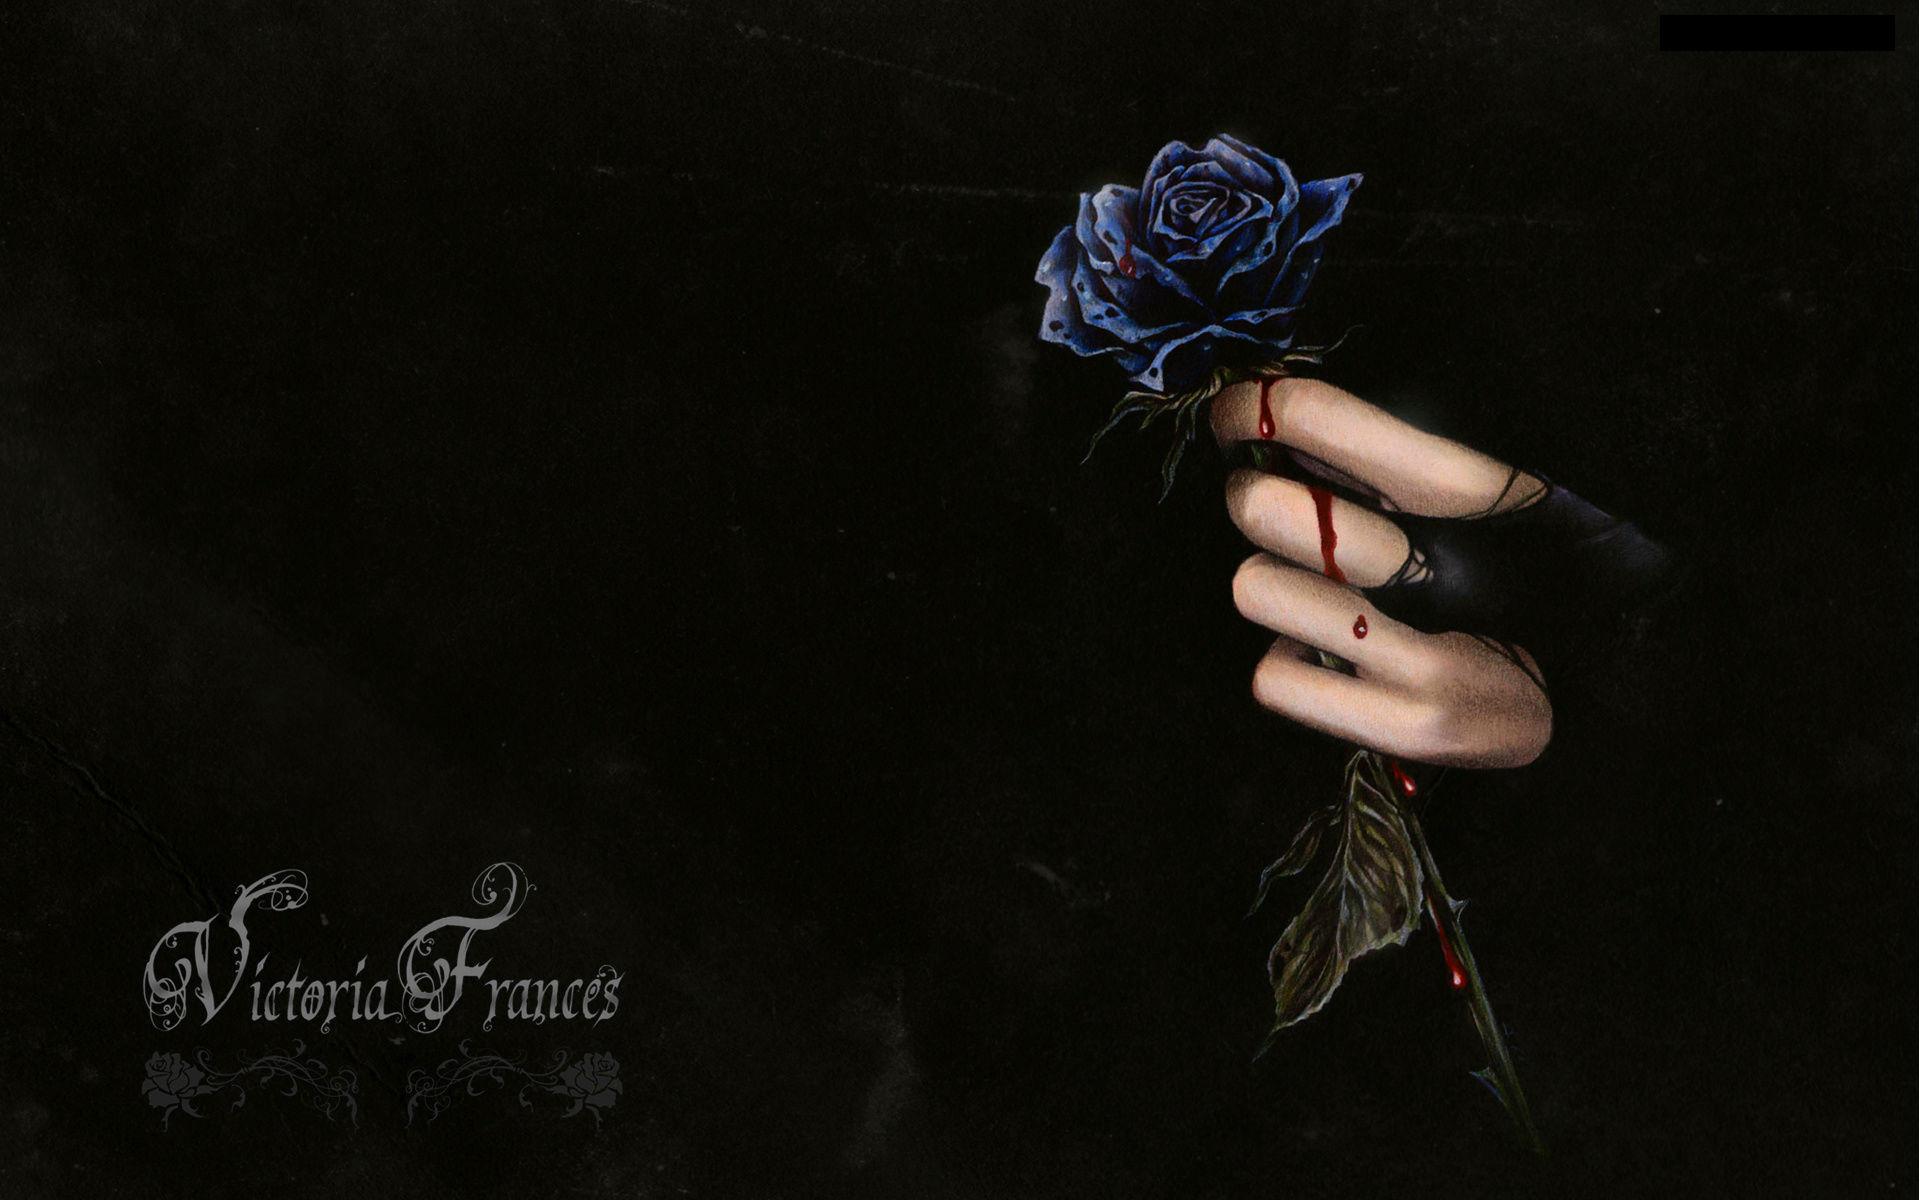 Dark horror fantasy gothic vampire blood flowers wallpaper 1920x1200 1920x1200